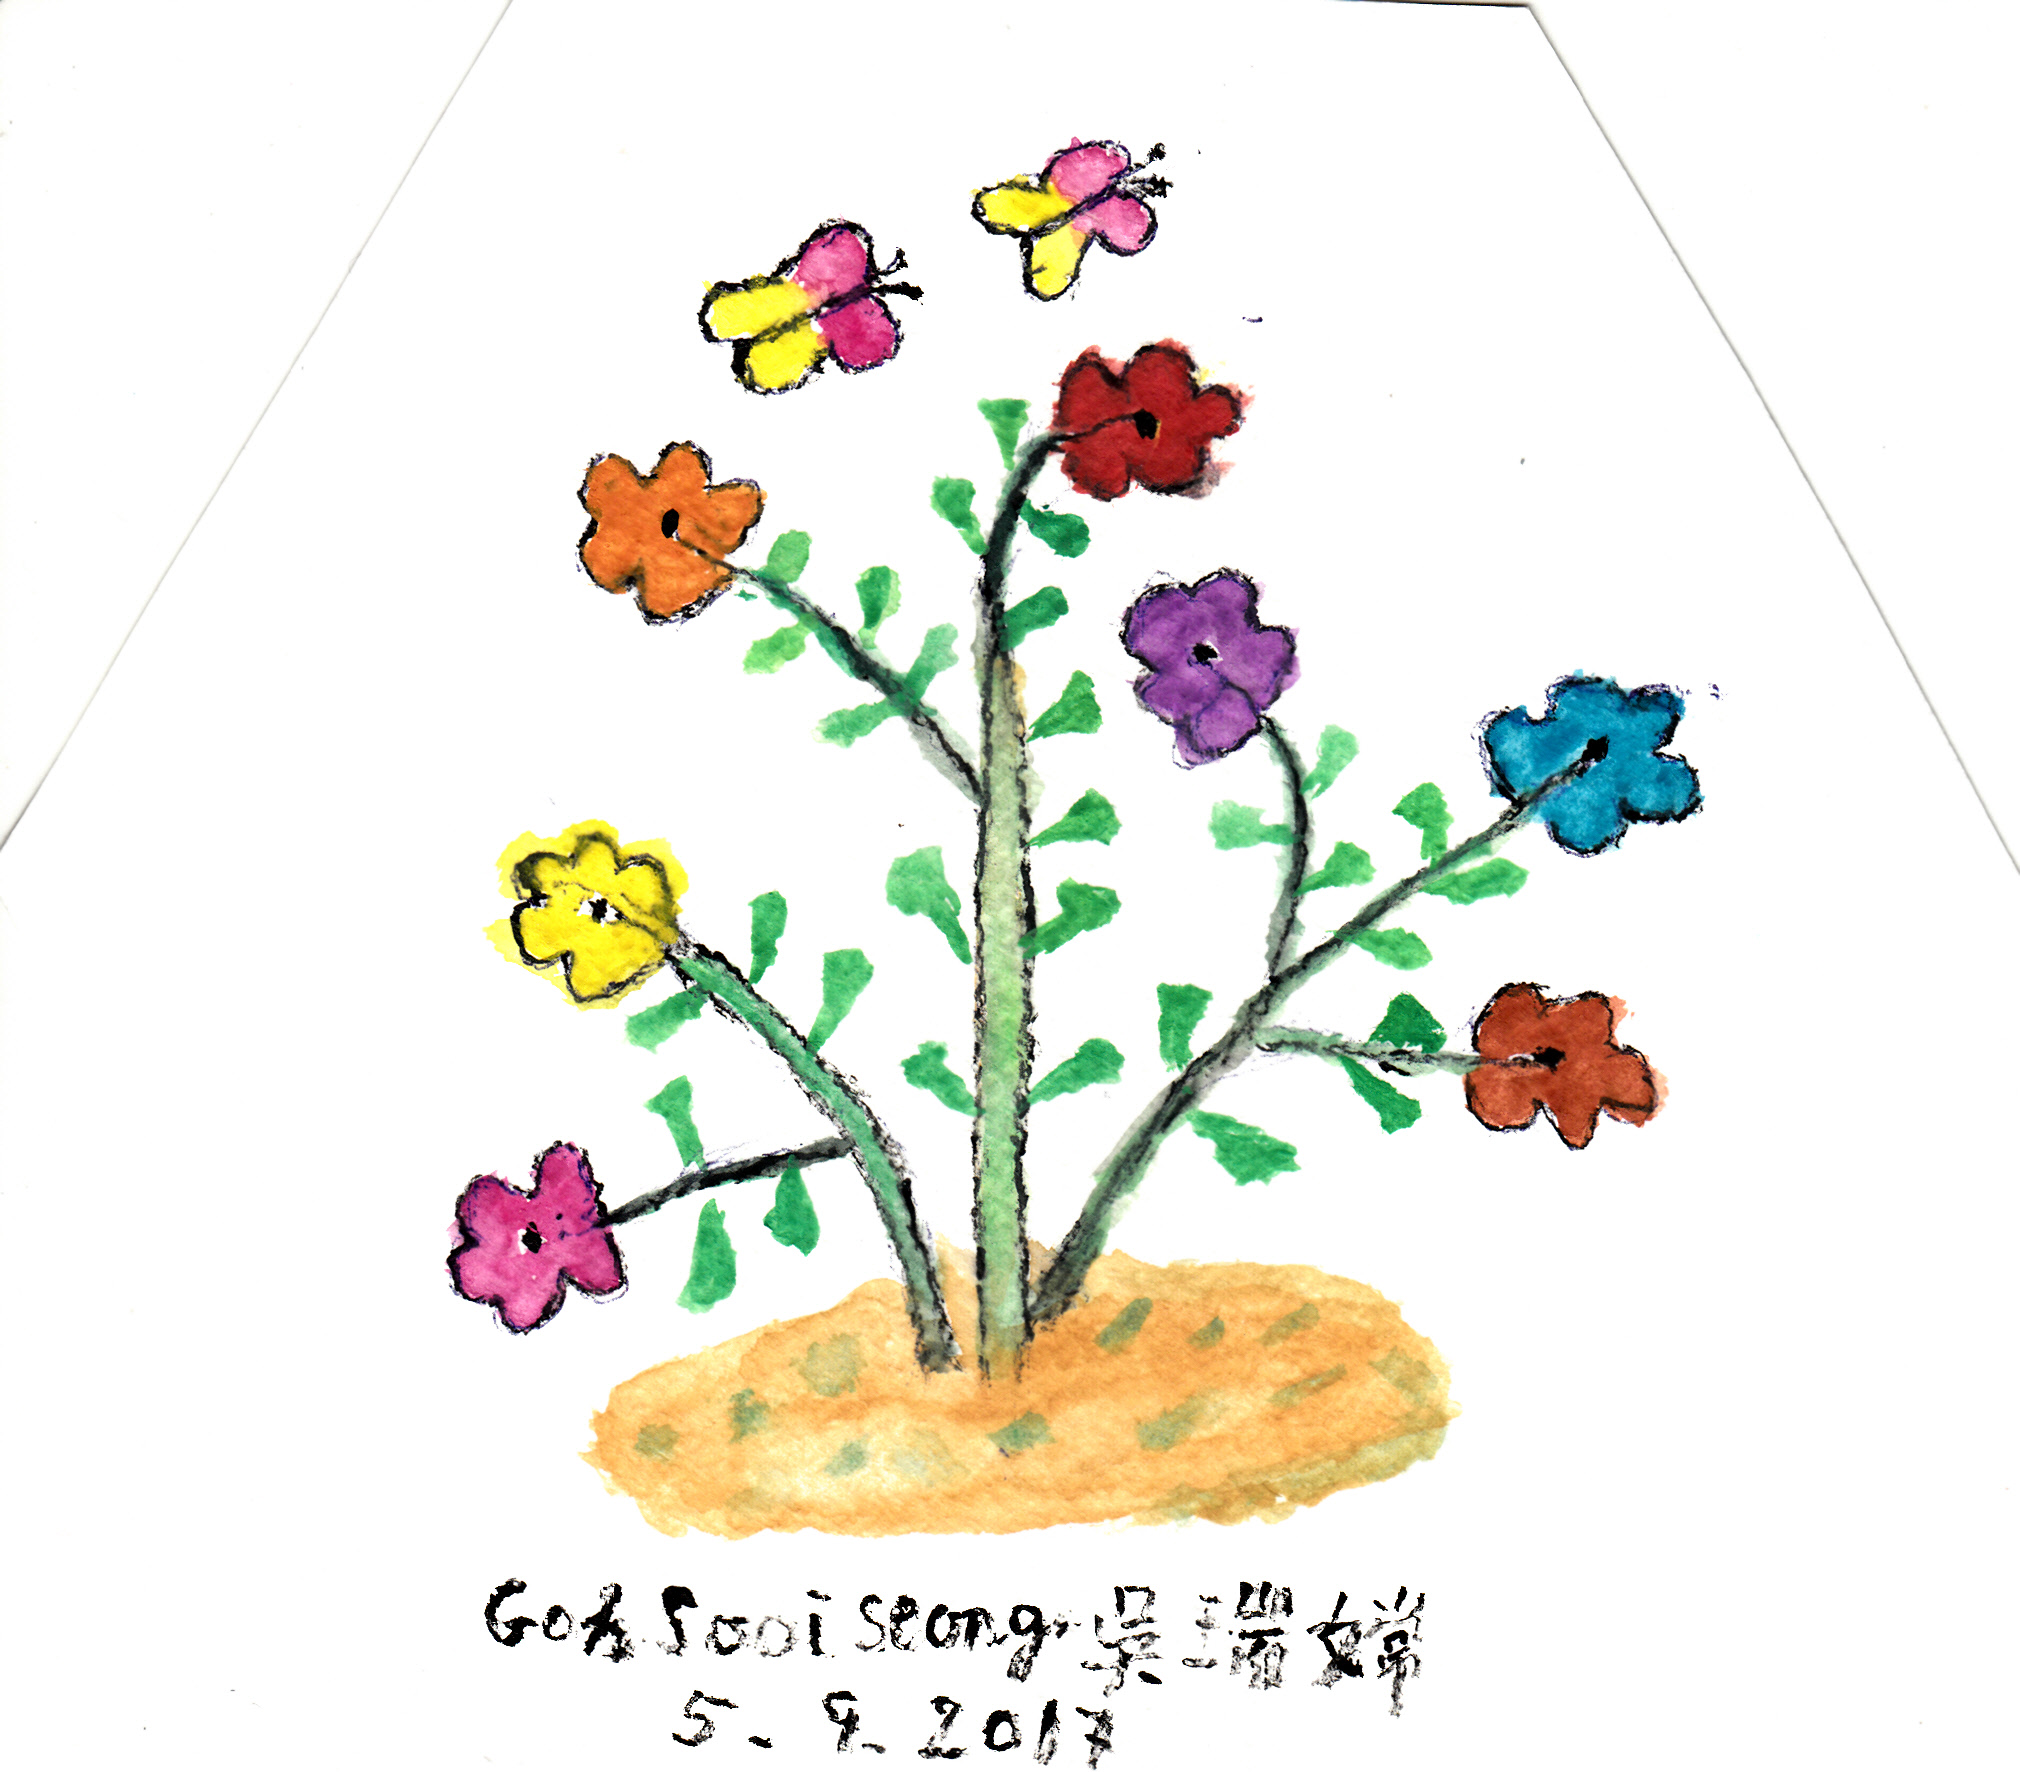 Goh Sooi Seong 20.jpg